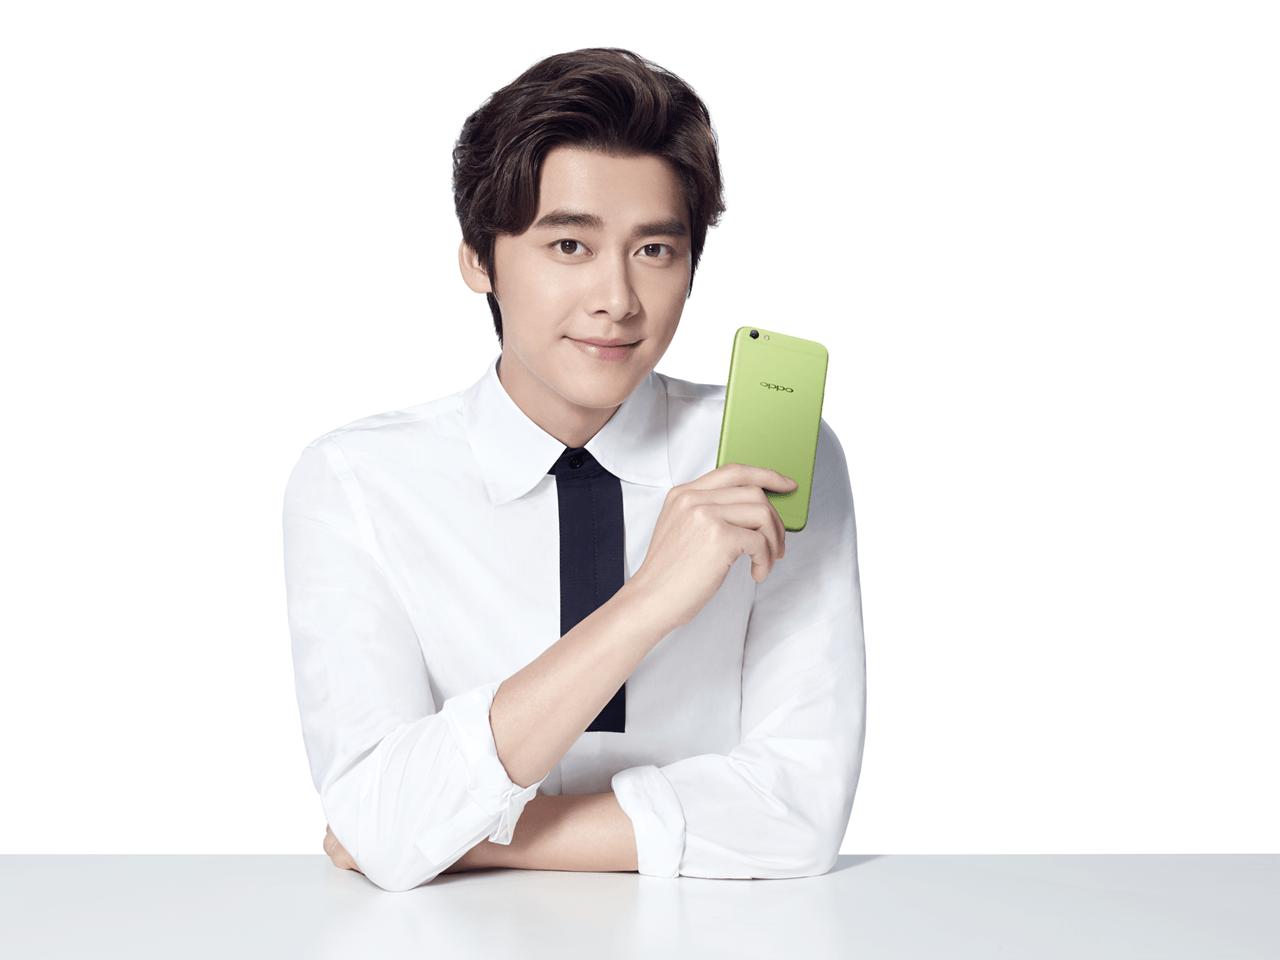 OPPO清新绿手机现身李易峰微电影